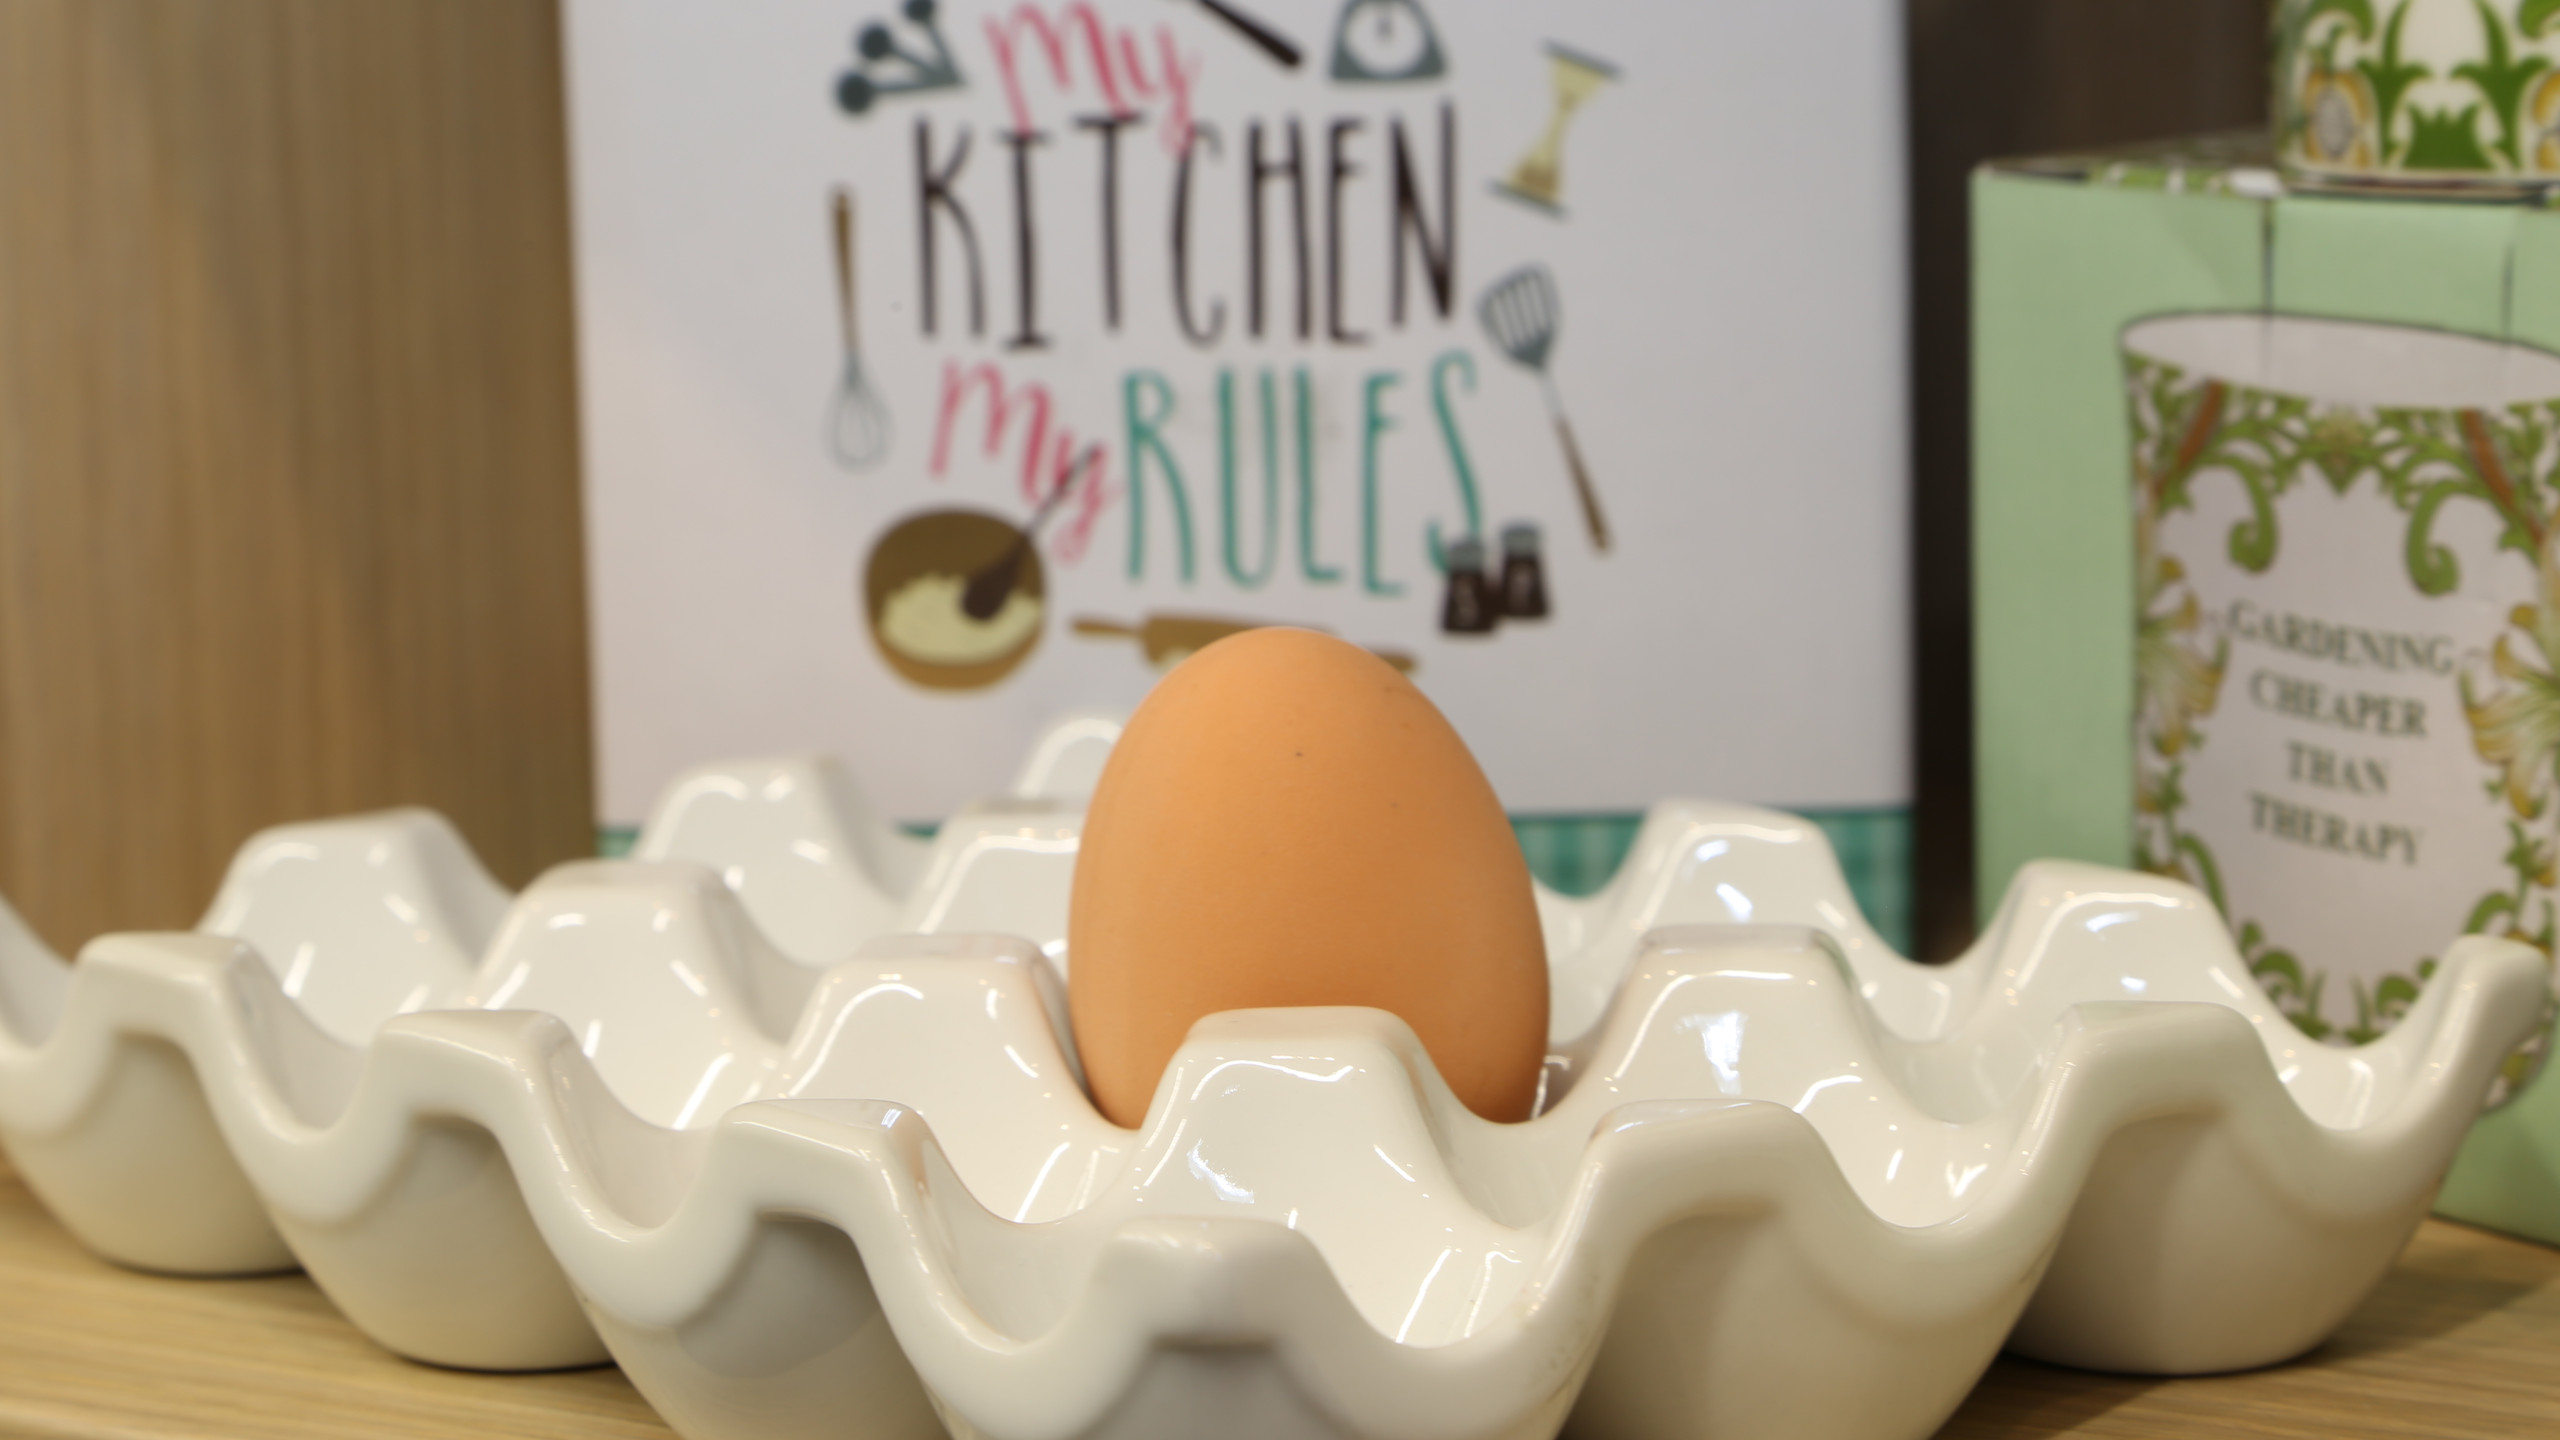 Kitchen ware egg holder